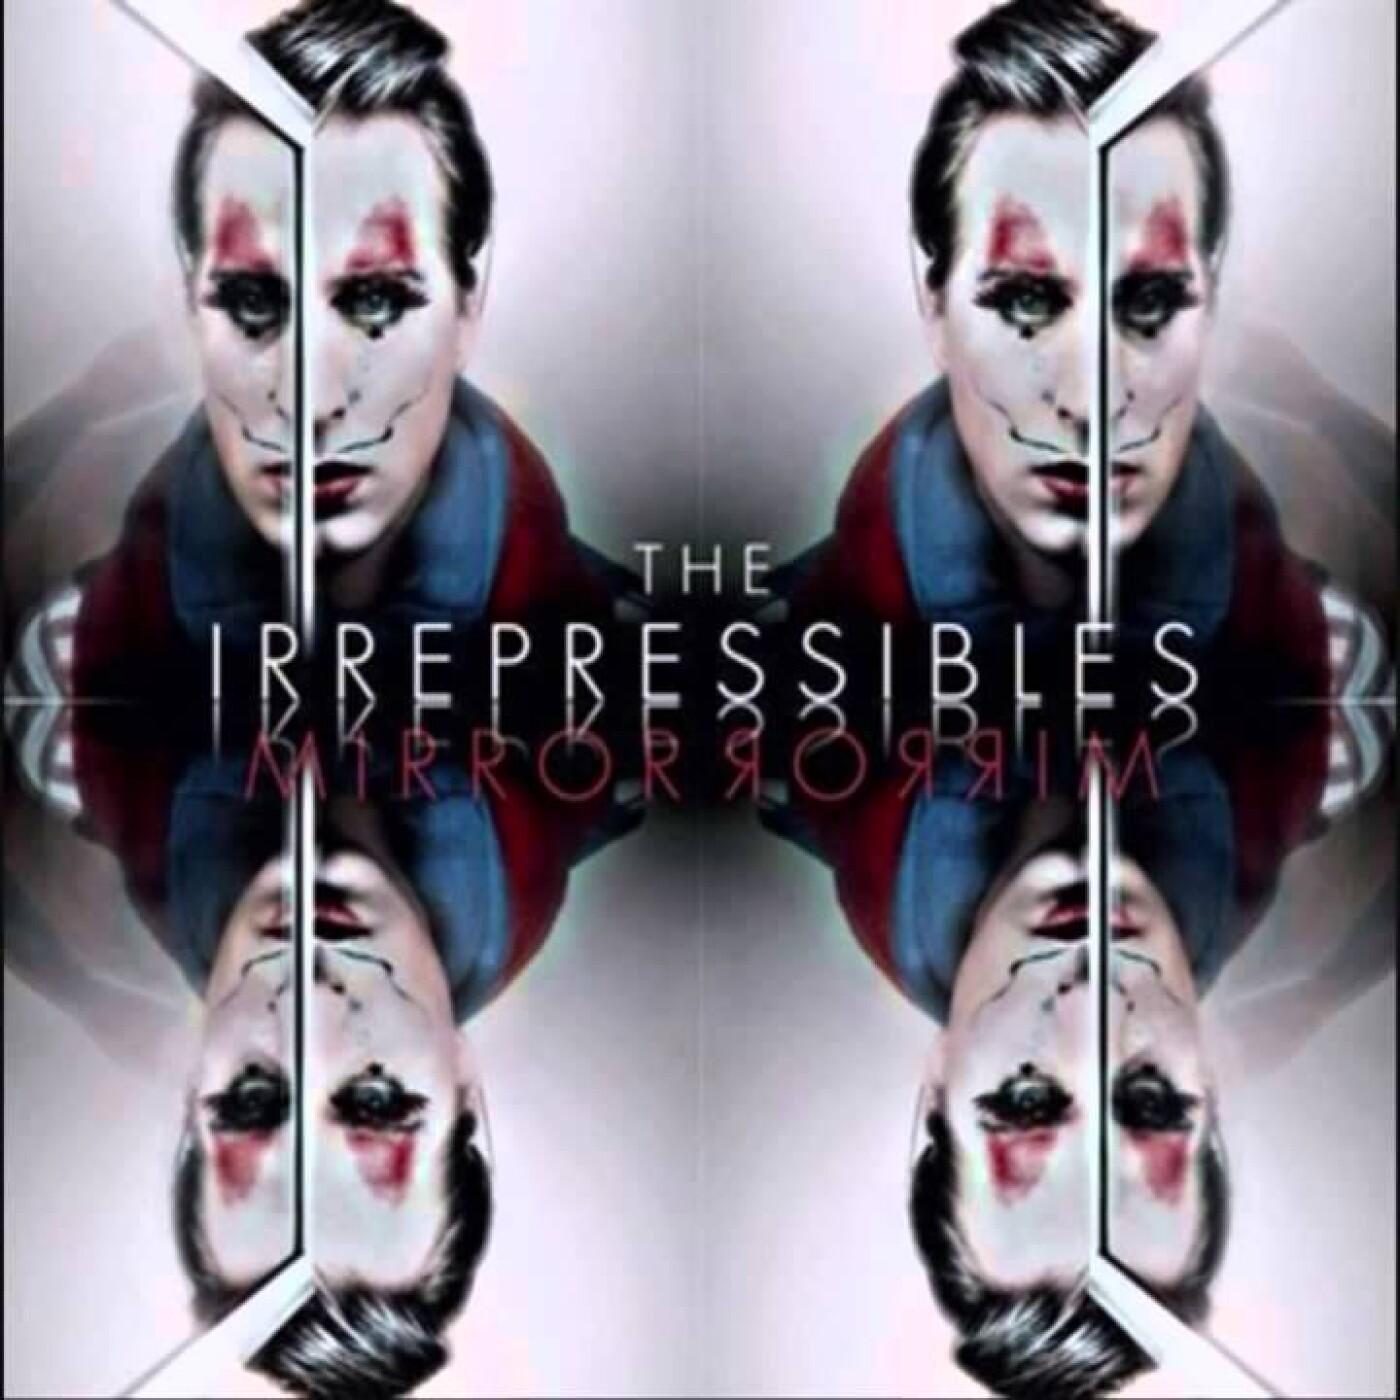 5 mn pour moi toute seule, Nata'Lee, The Irrepressibles - In This Shirt (Royksopp Remix) - 31 08 2021 - StereoChic Radio